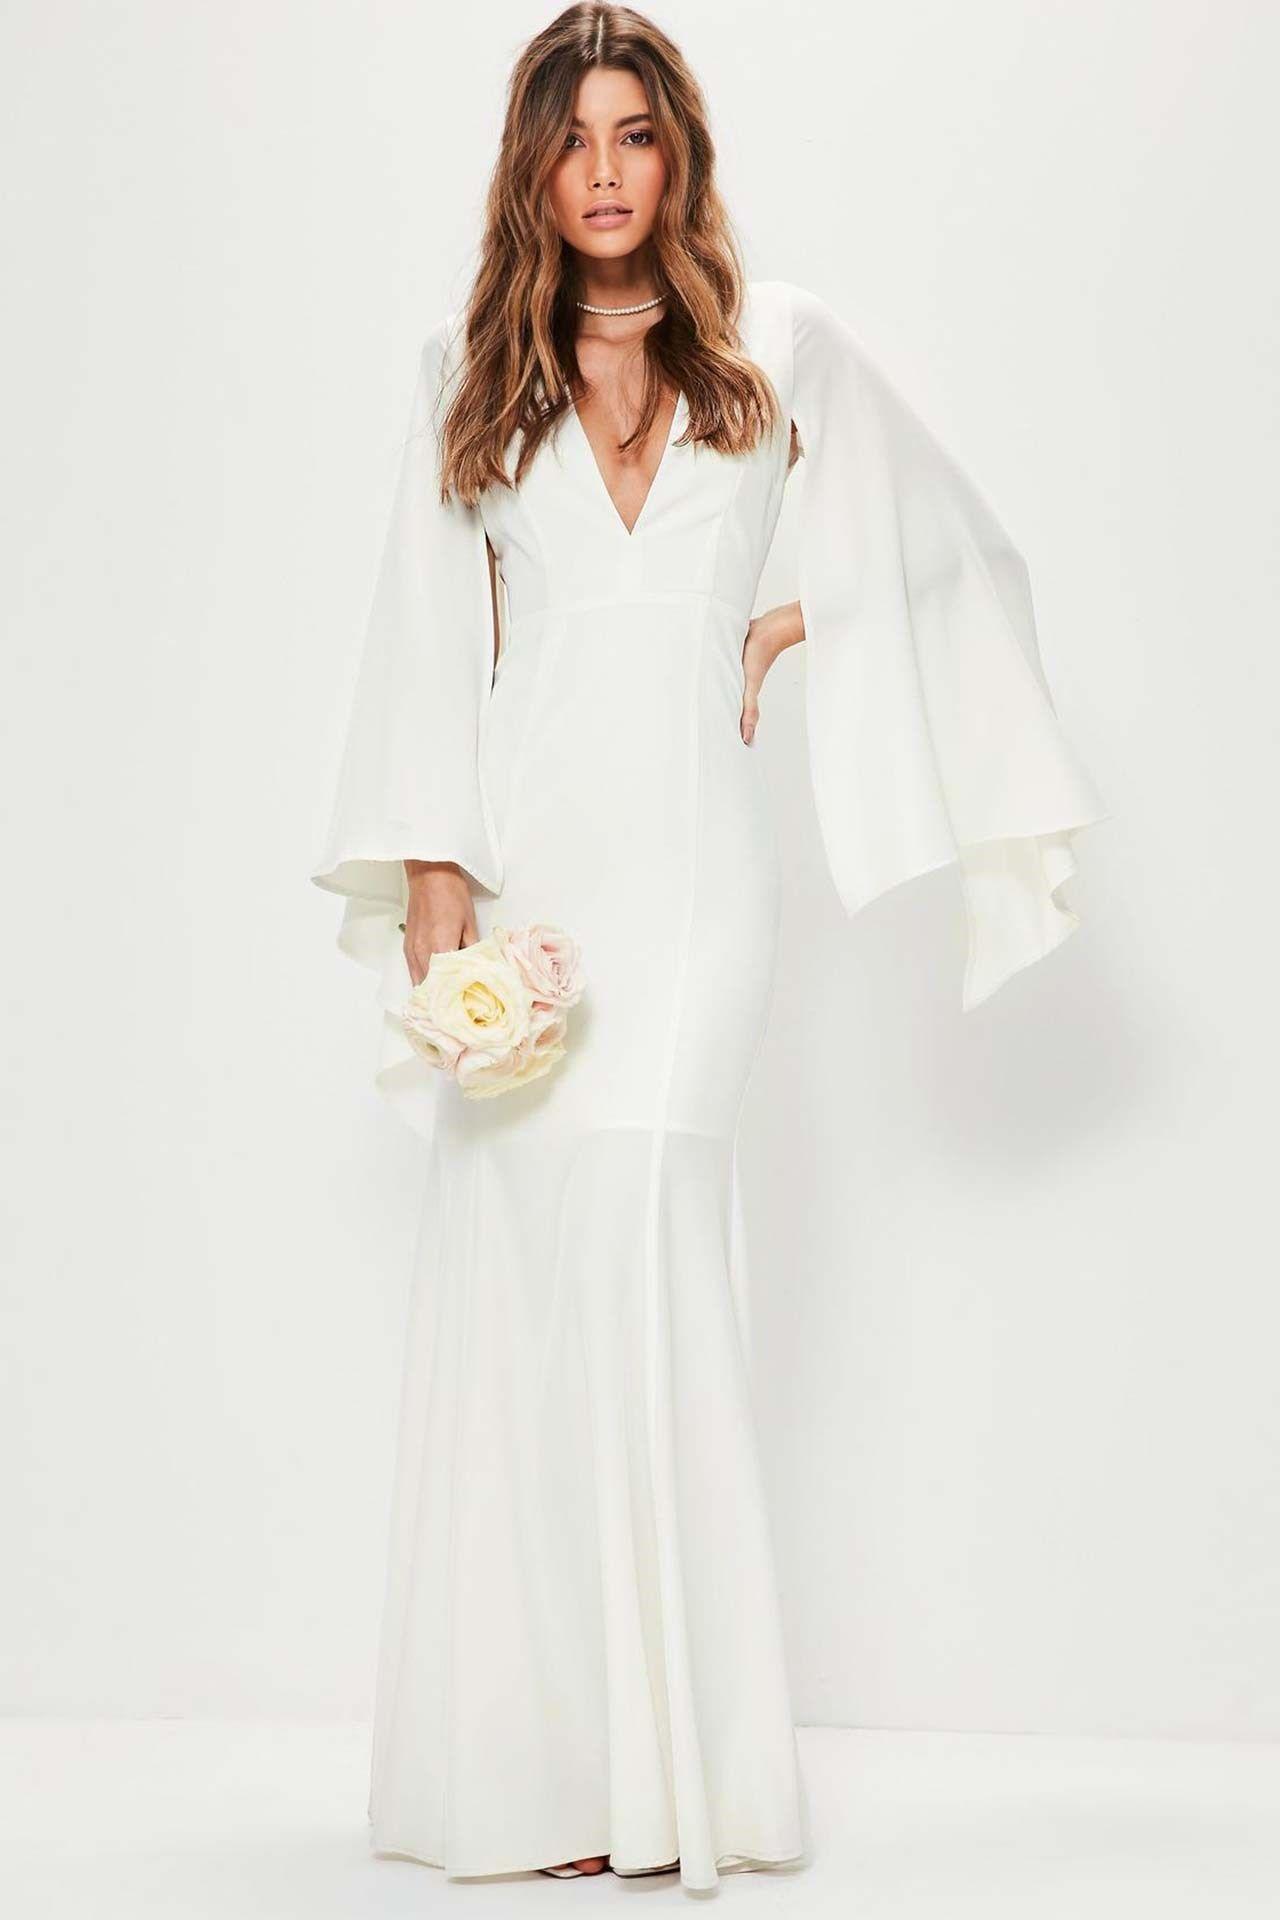 45ed41fcff4 Cheap Wedding Dresses From High Street Brands (BridesMagazine.co.uk)